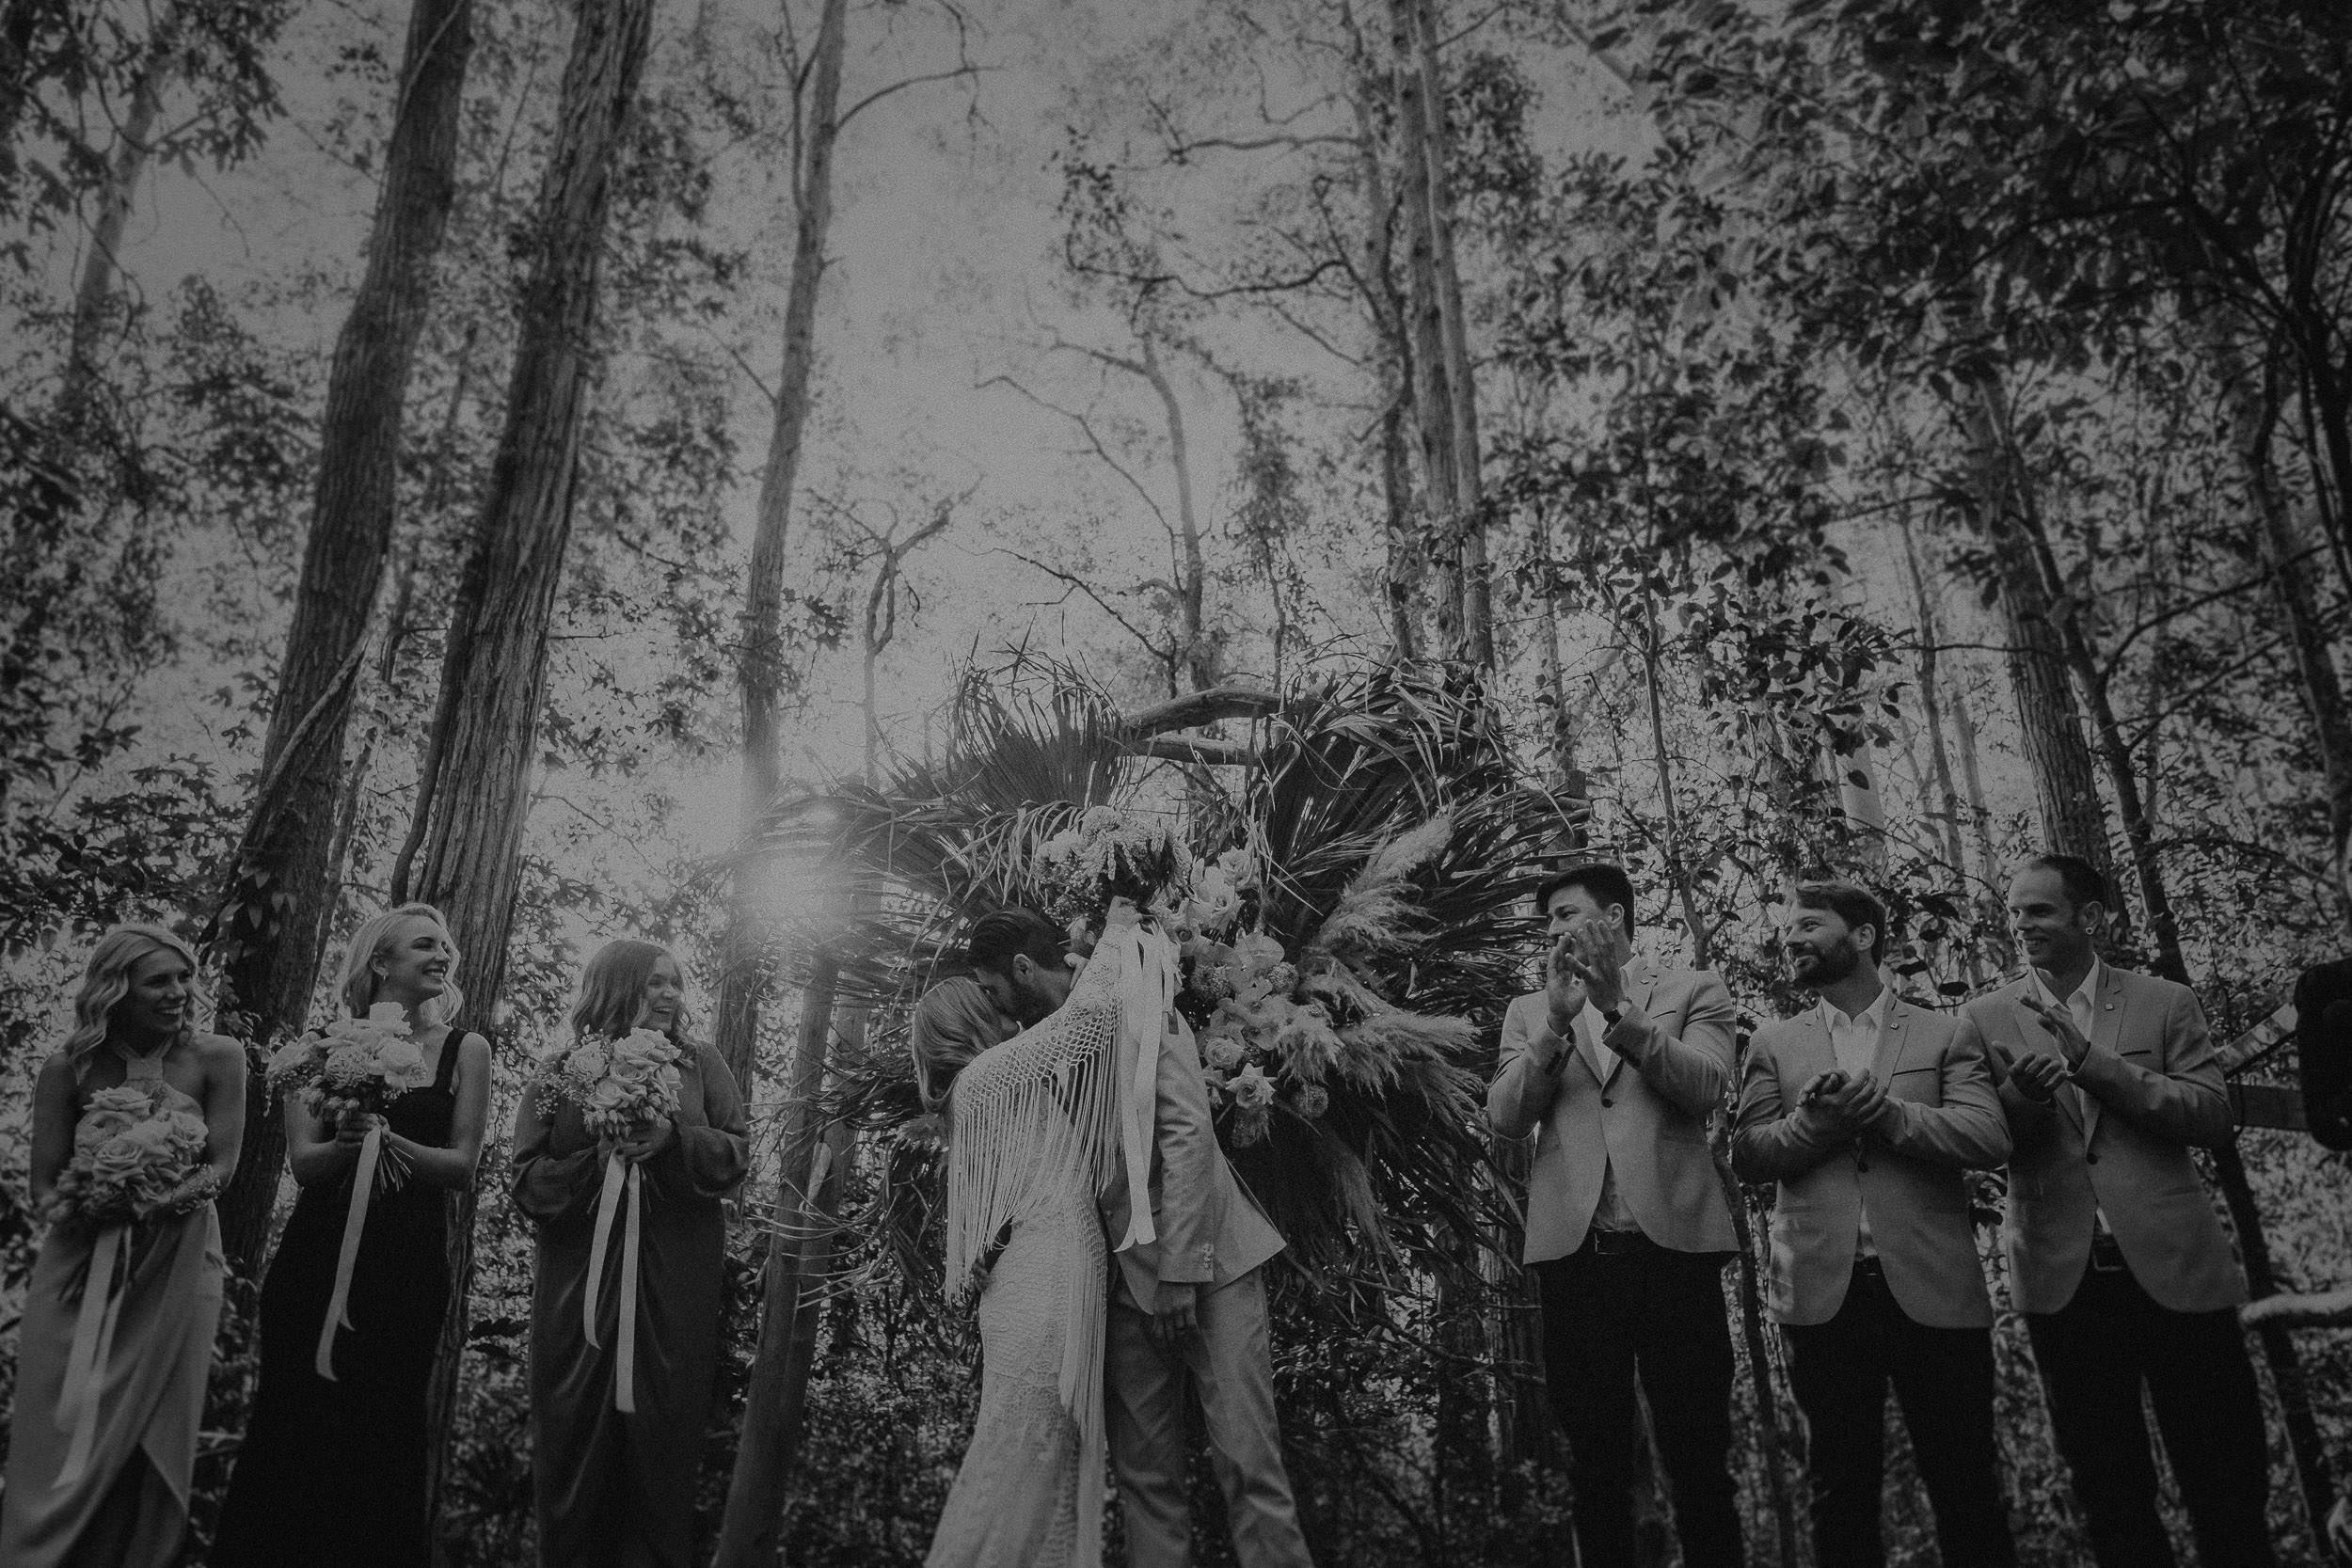 S&A Elopement - Kings & Thieves - Shred 'Til Dead - Central Coast Beach Forest Wedding - 263.jpg